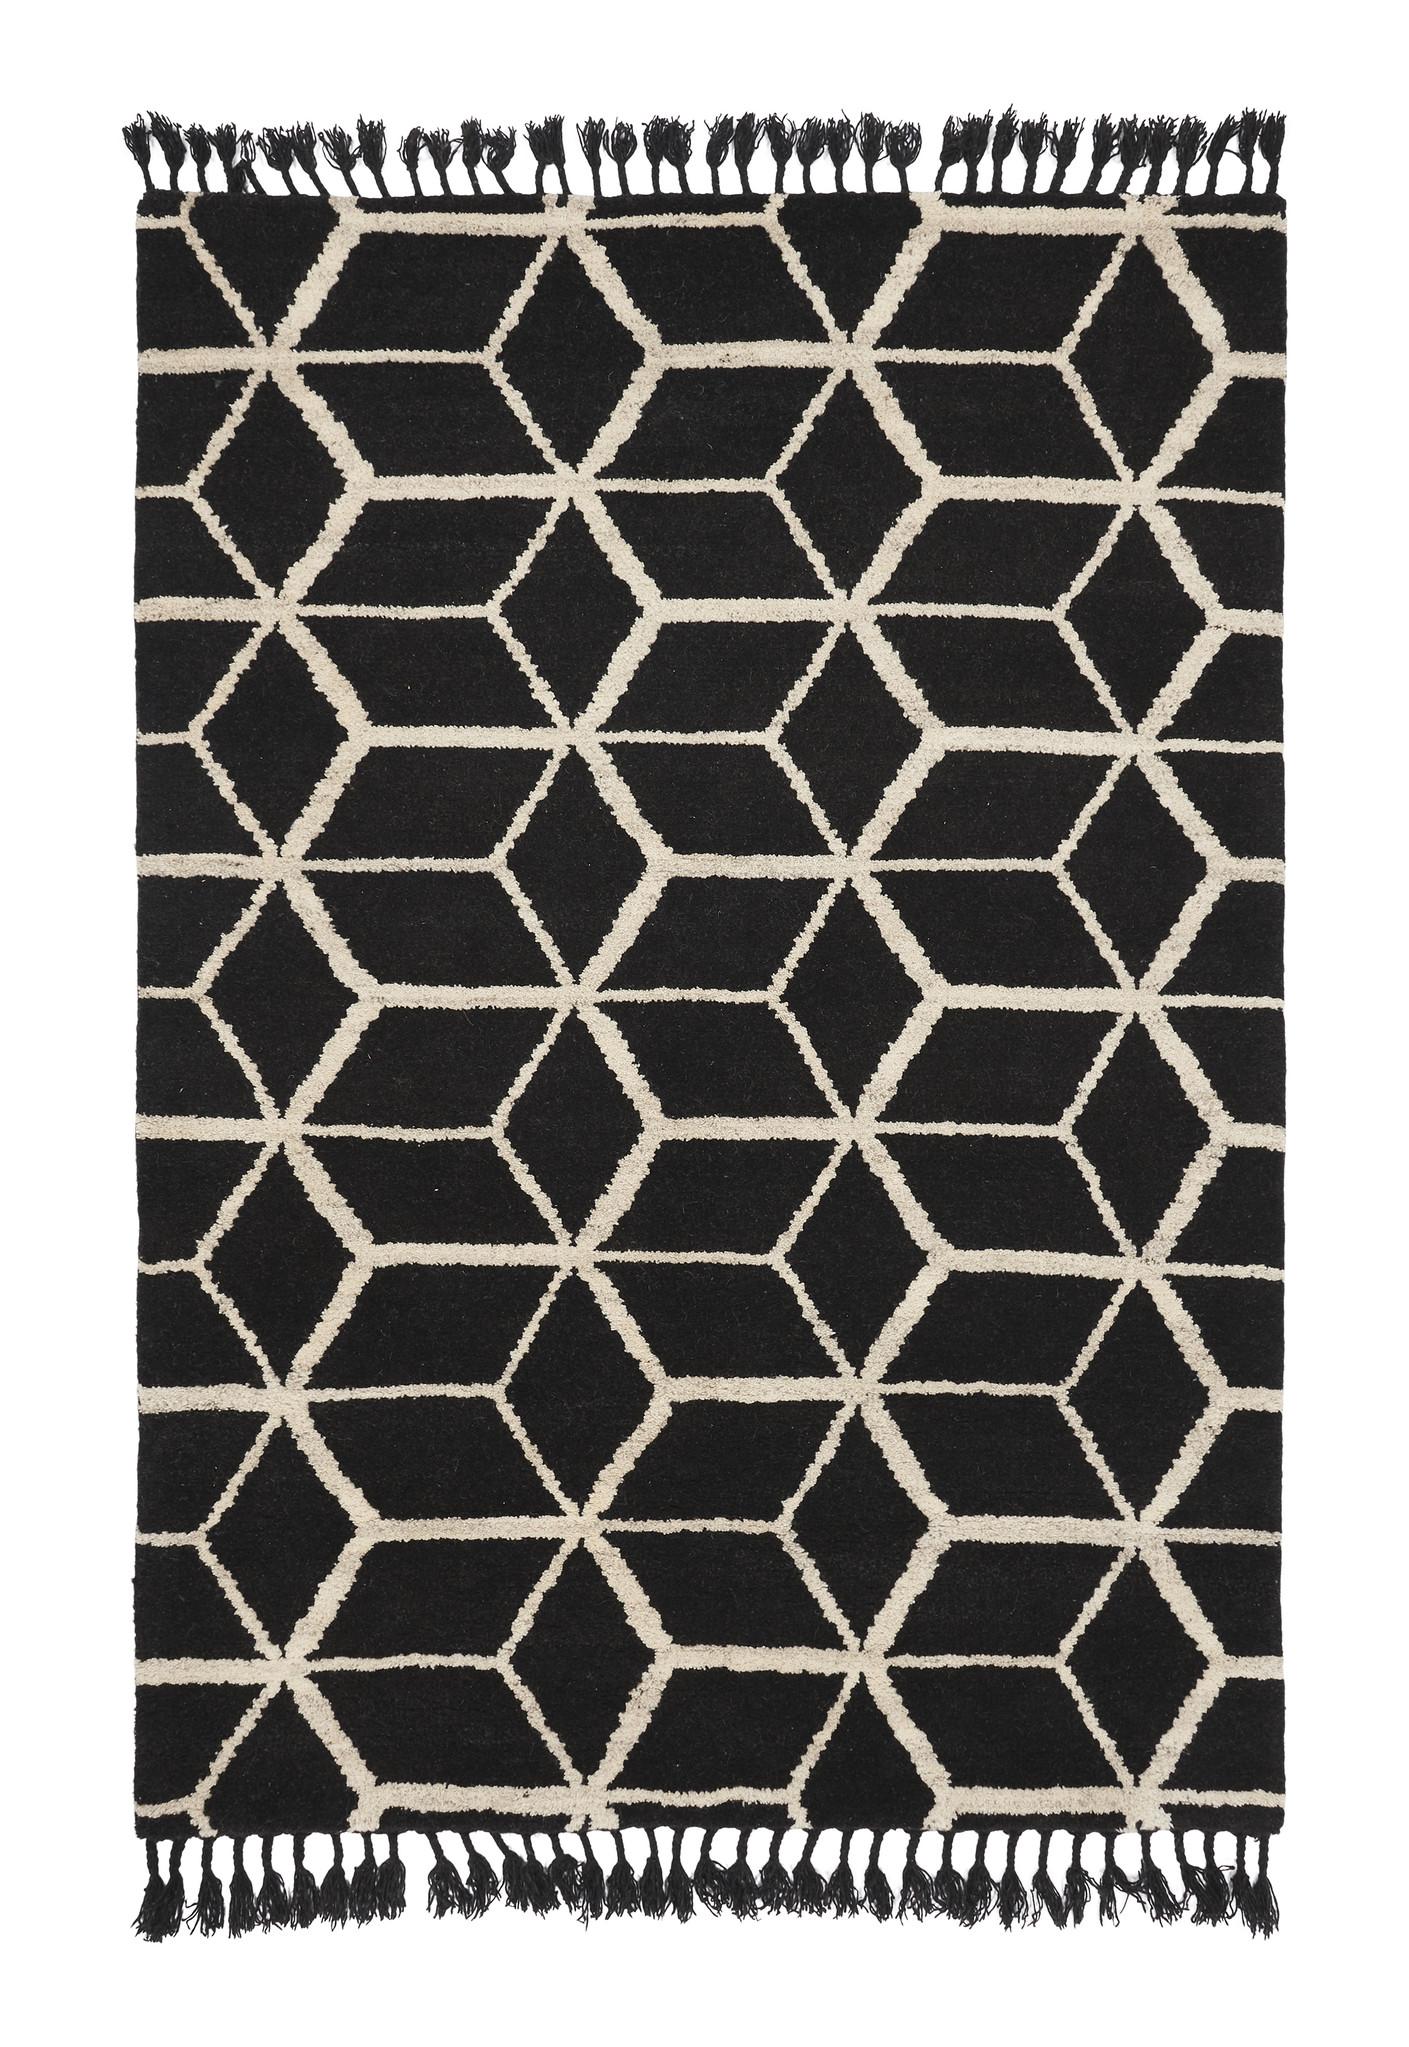 Brink en Campman Arabiska Geometrisk 63301-2